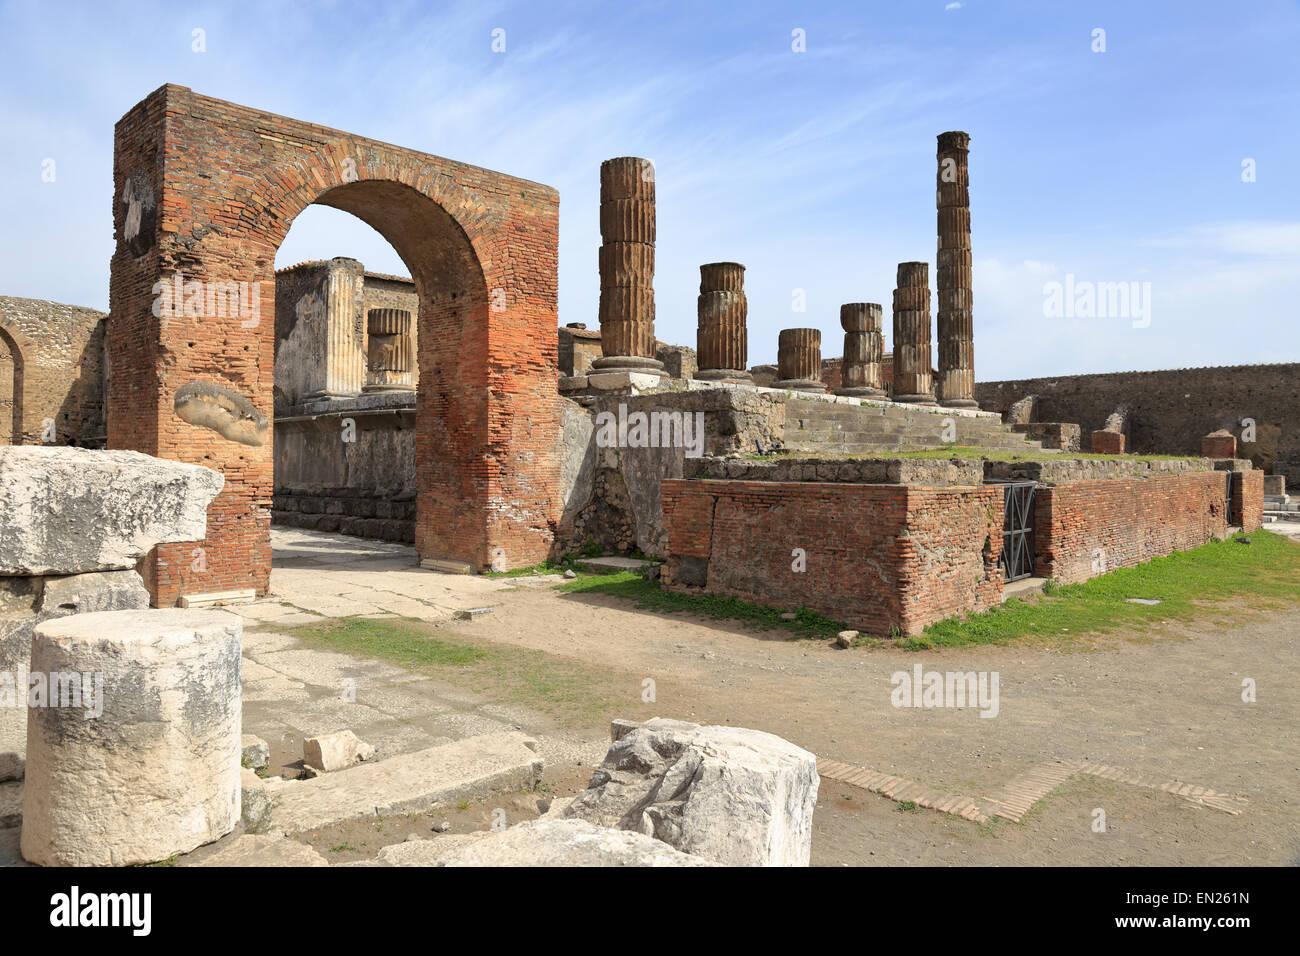 Bogen und Tempel des Jupiter im Forum, Pompeji, Italien. Stockfoto